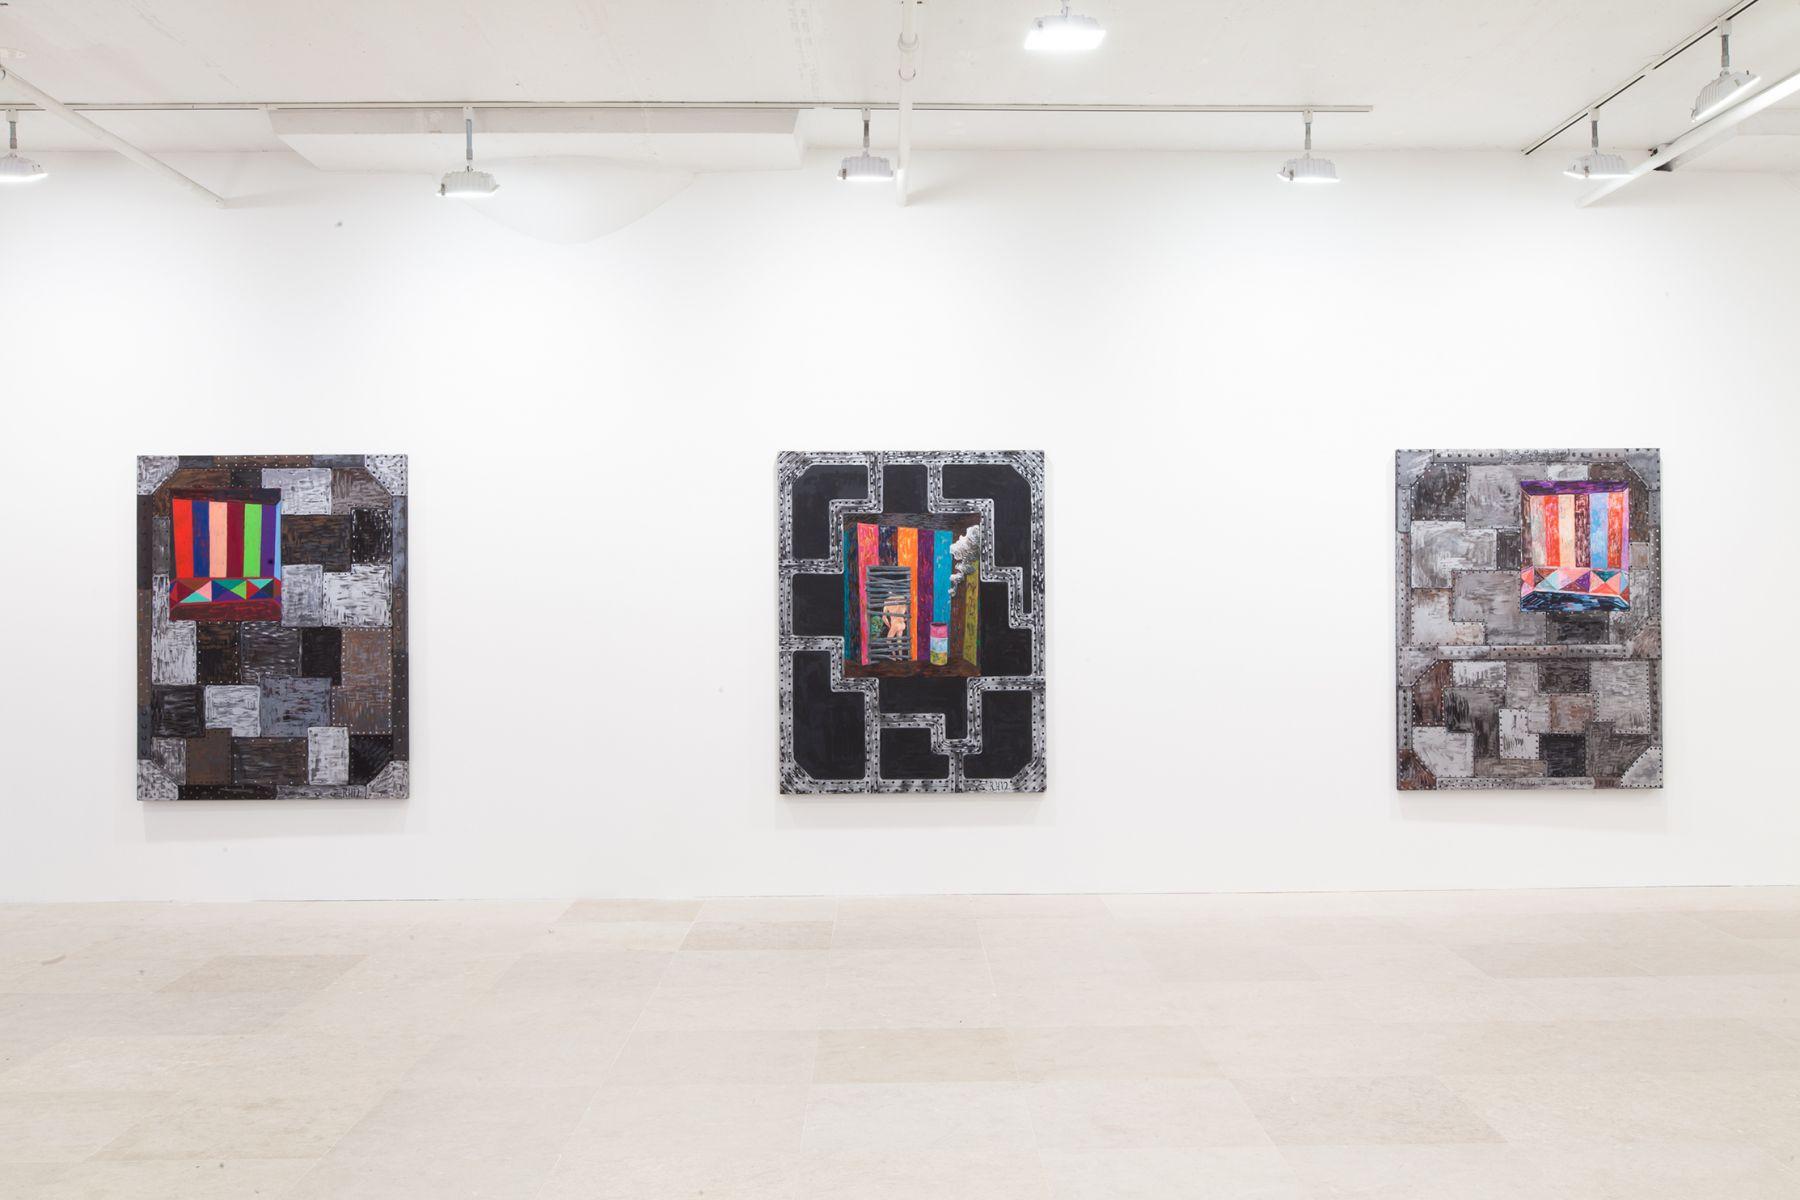 Installation view, Greene Naftali, New York, 2012